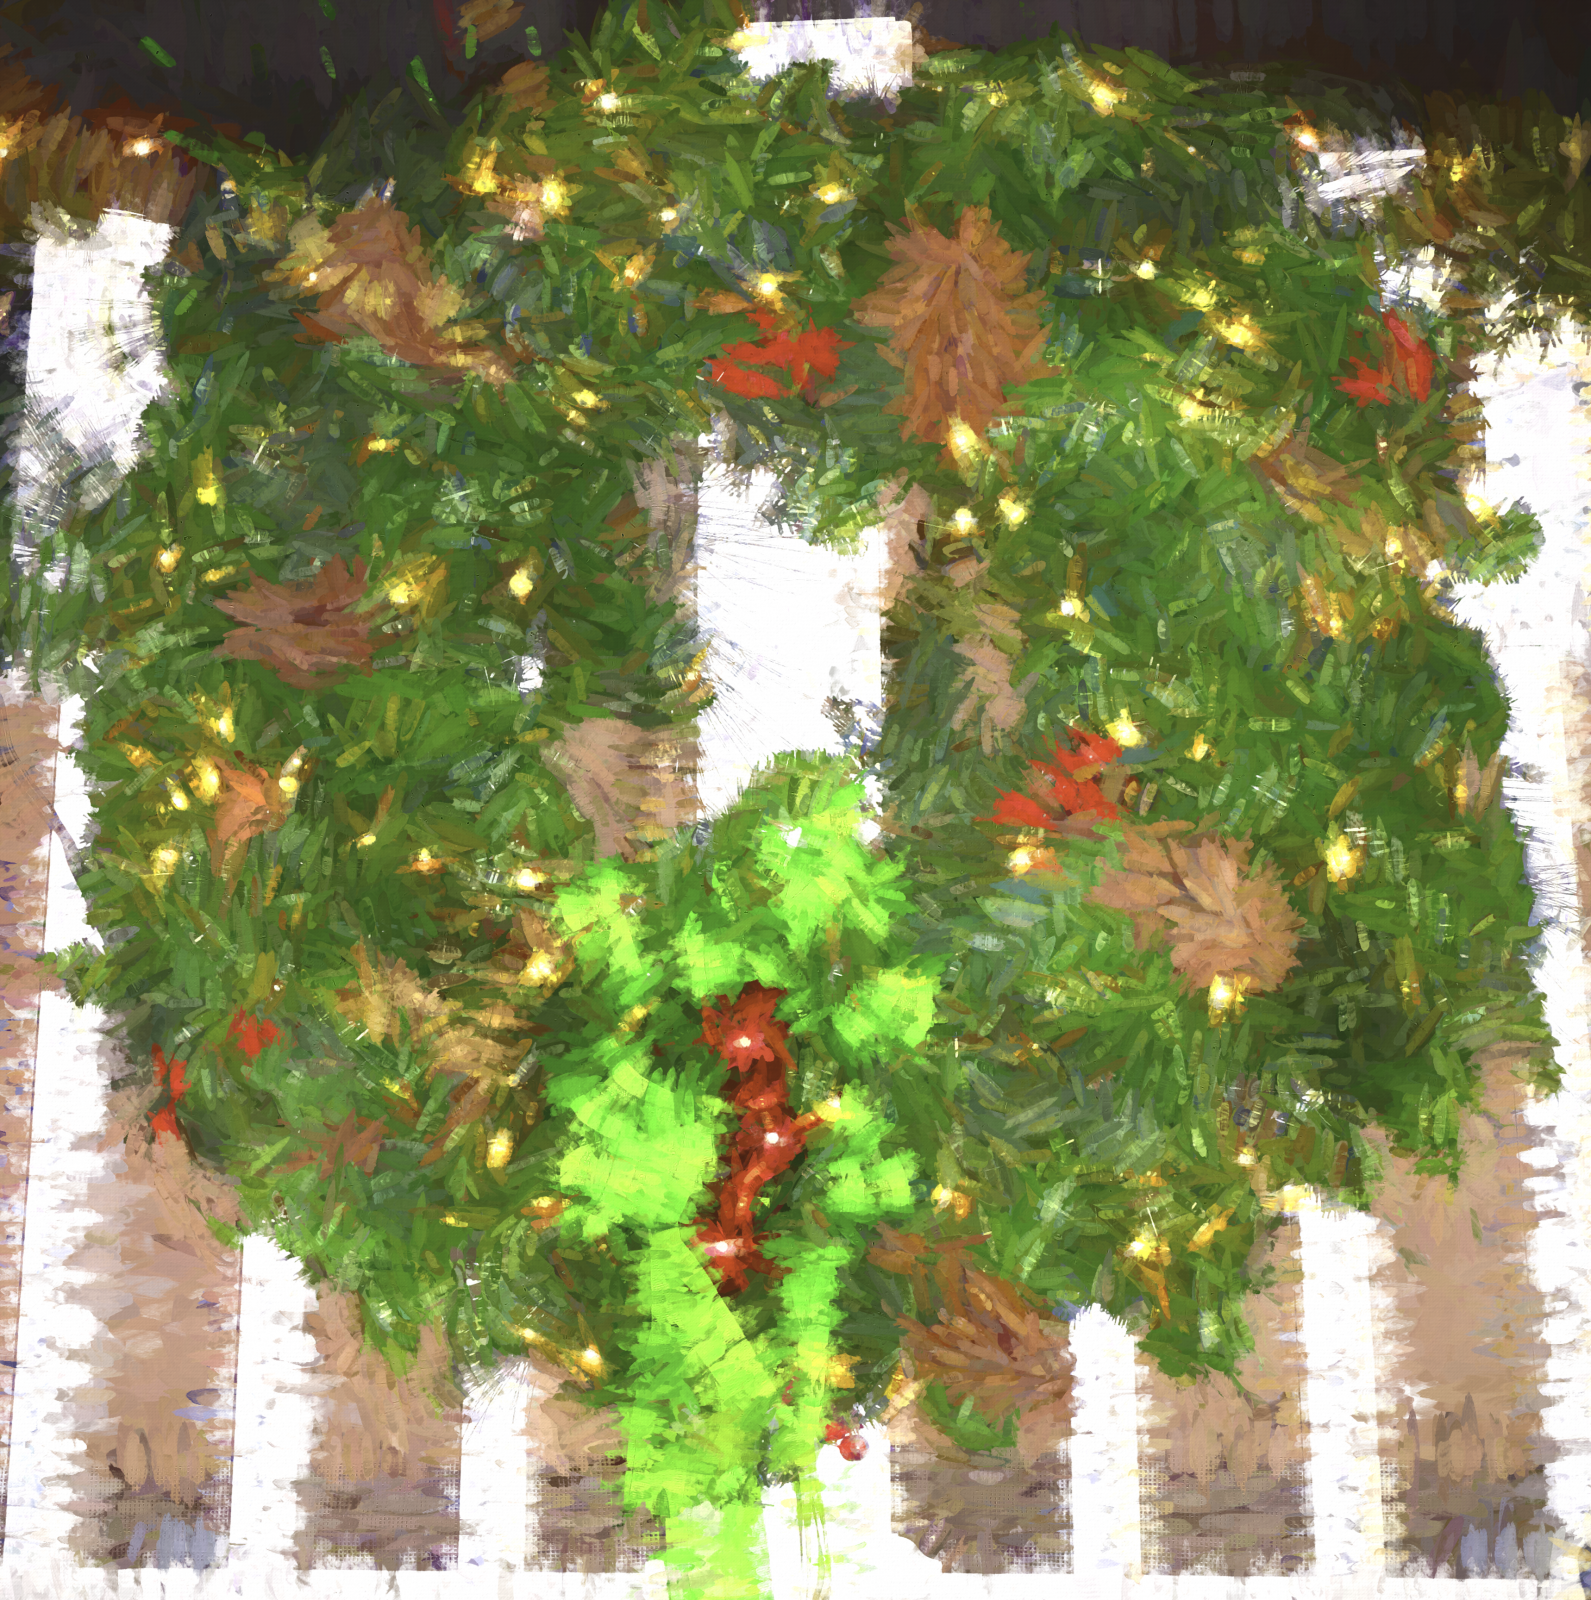 wreath.png.83a26f06238b145adbf9fd54cf7fc2c4.png